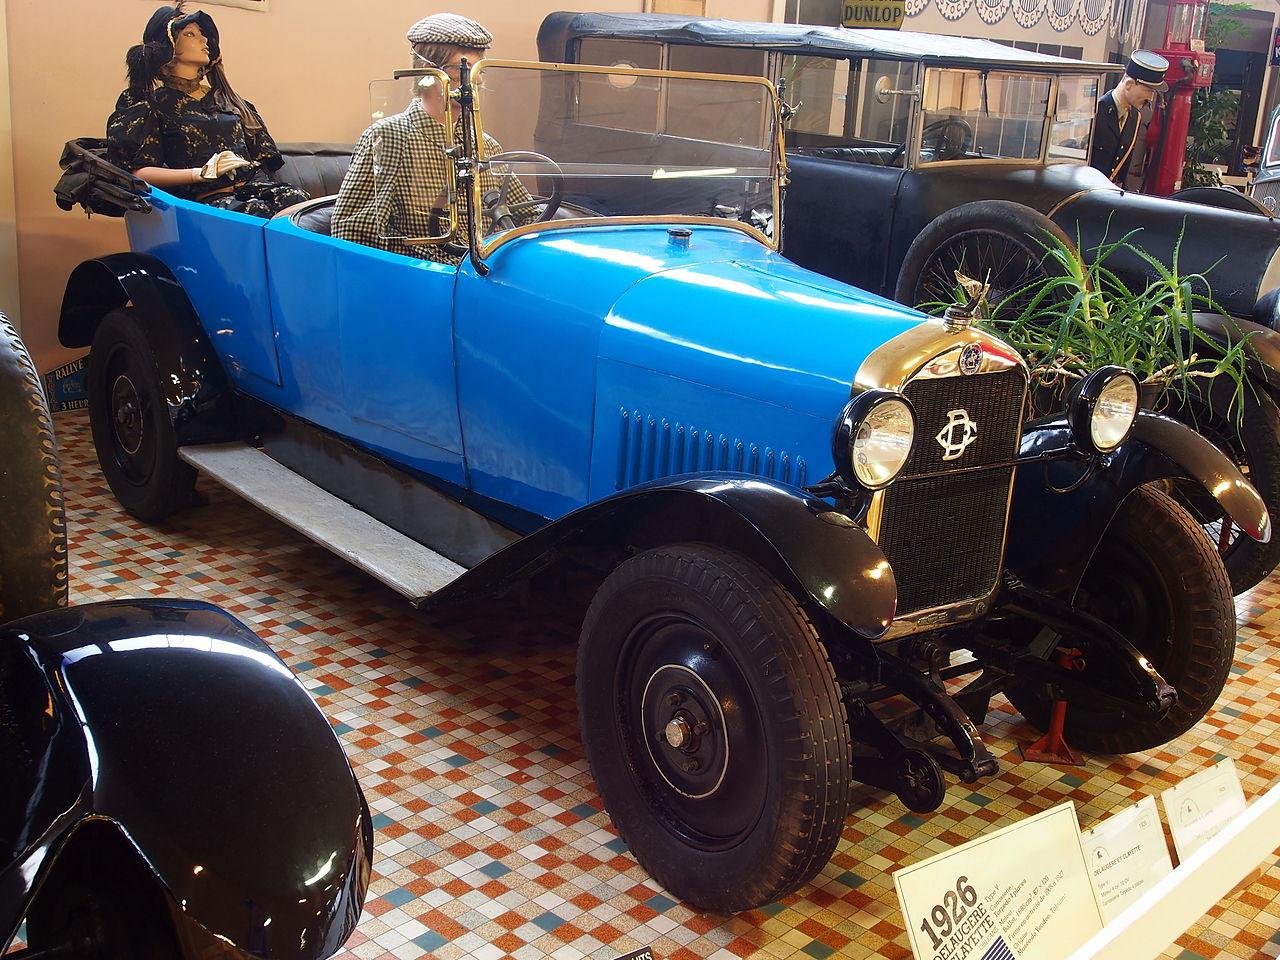 file 1926 delaugere et clayette v 4 cyl 10cv at the mus e automobile de vend e pic 1 jpg. Black Bedroom Furniture Sets. Home Design Ideas